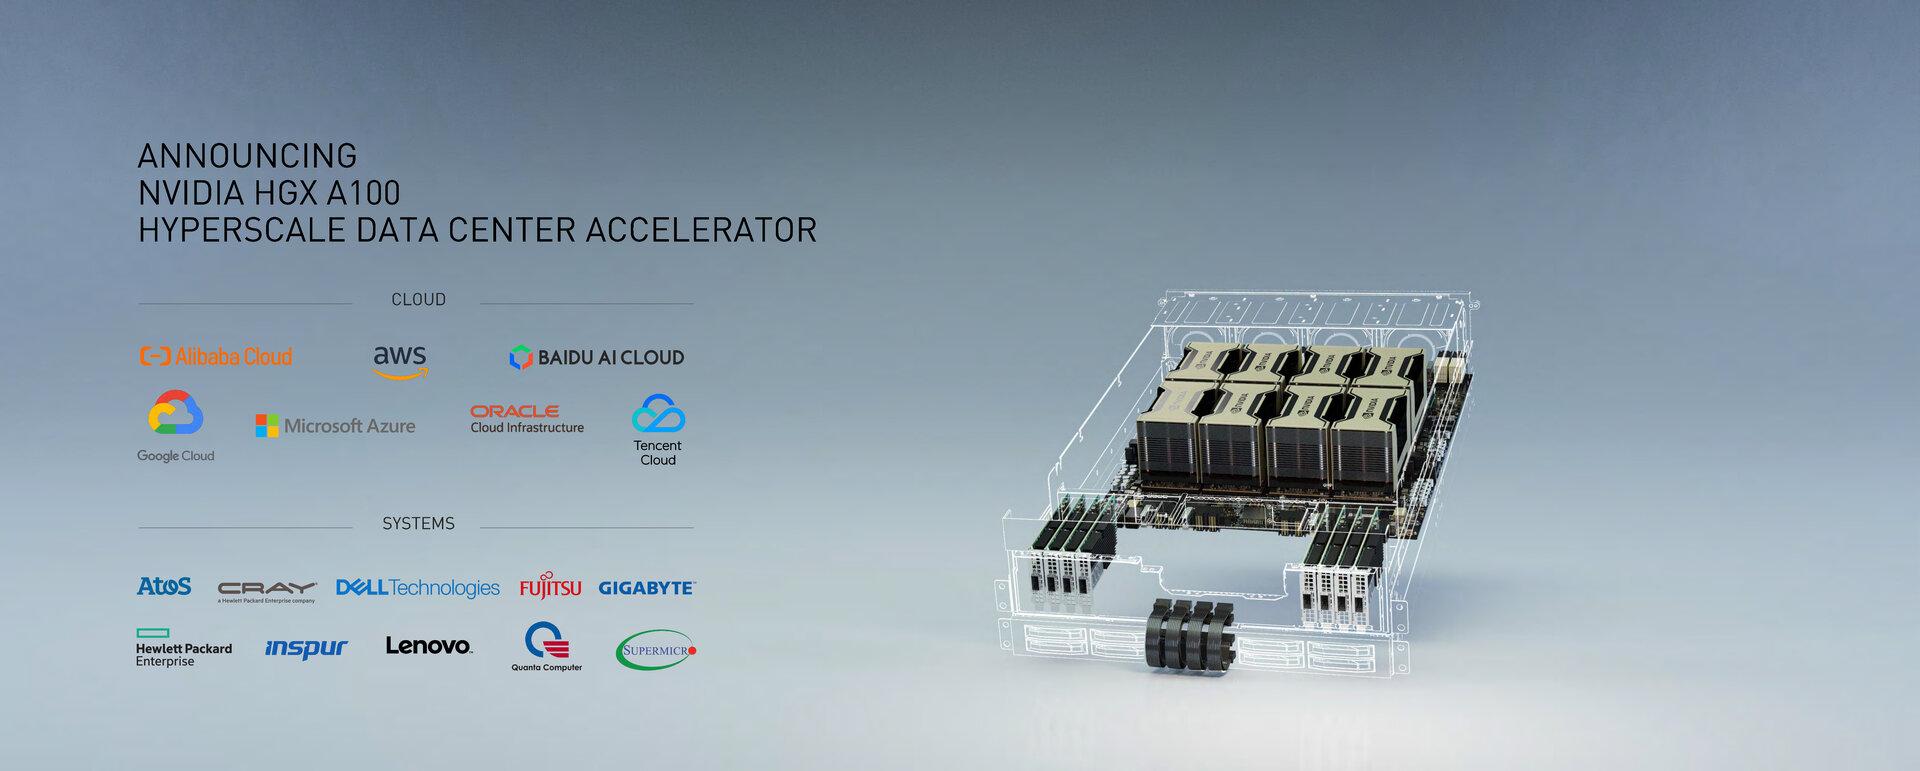 HGX A100 als Barebone aus GPUs, Board und Mellanox-Interfaces